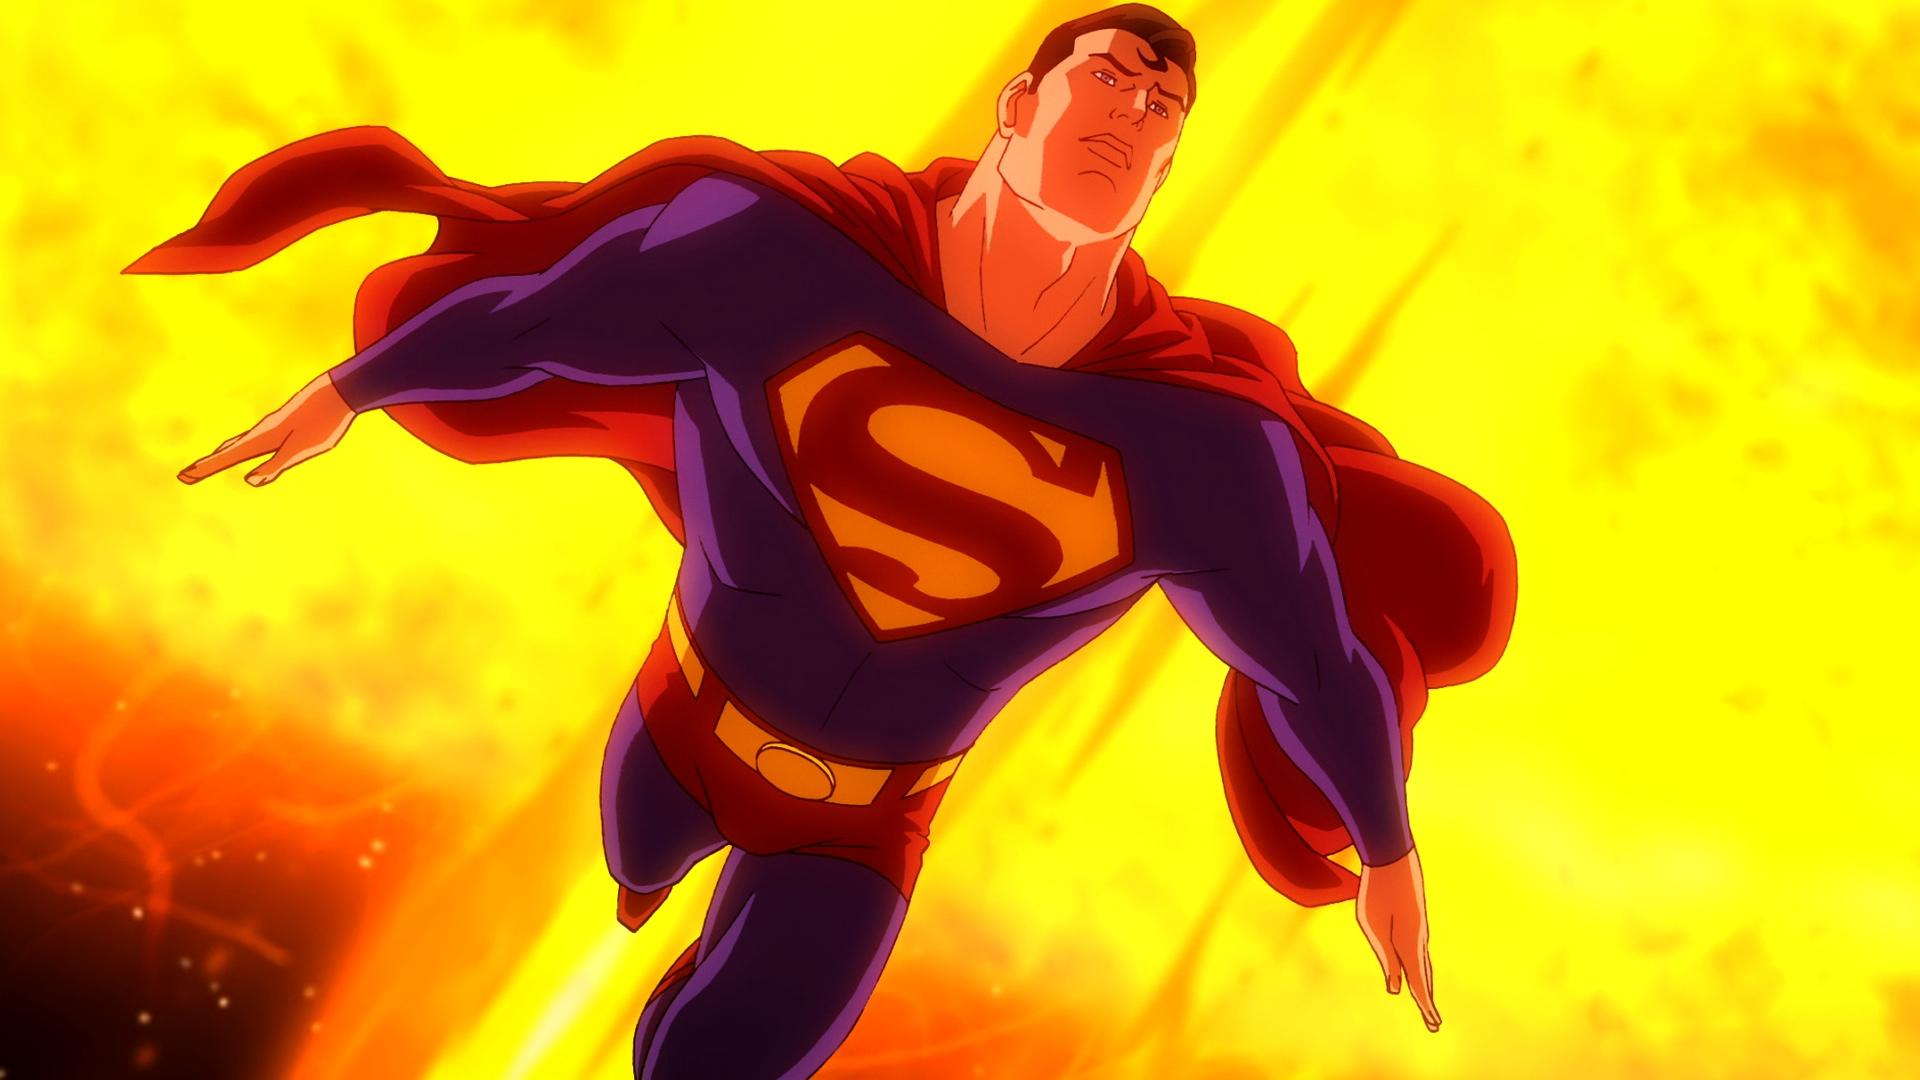 superman voando próximo ao sol